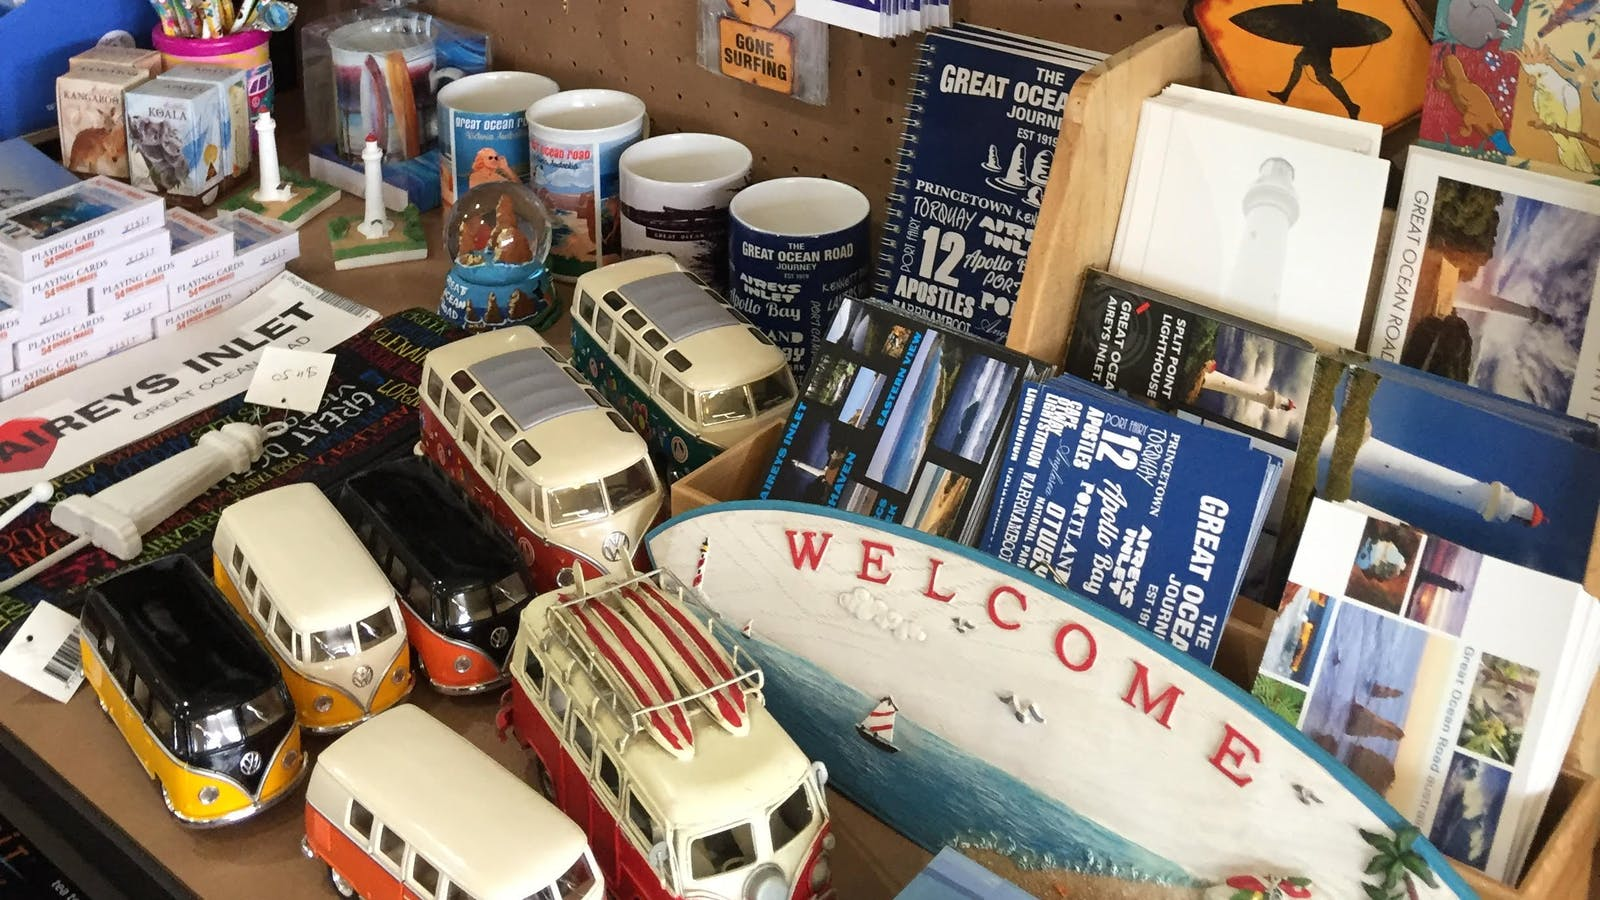 Mementos of your Great Ocean Road trip